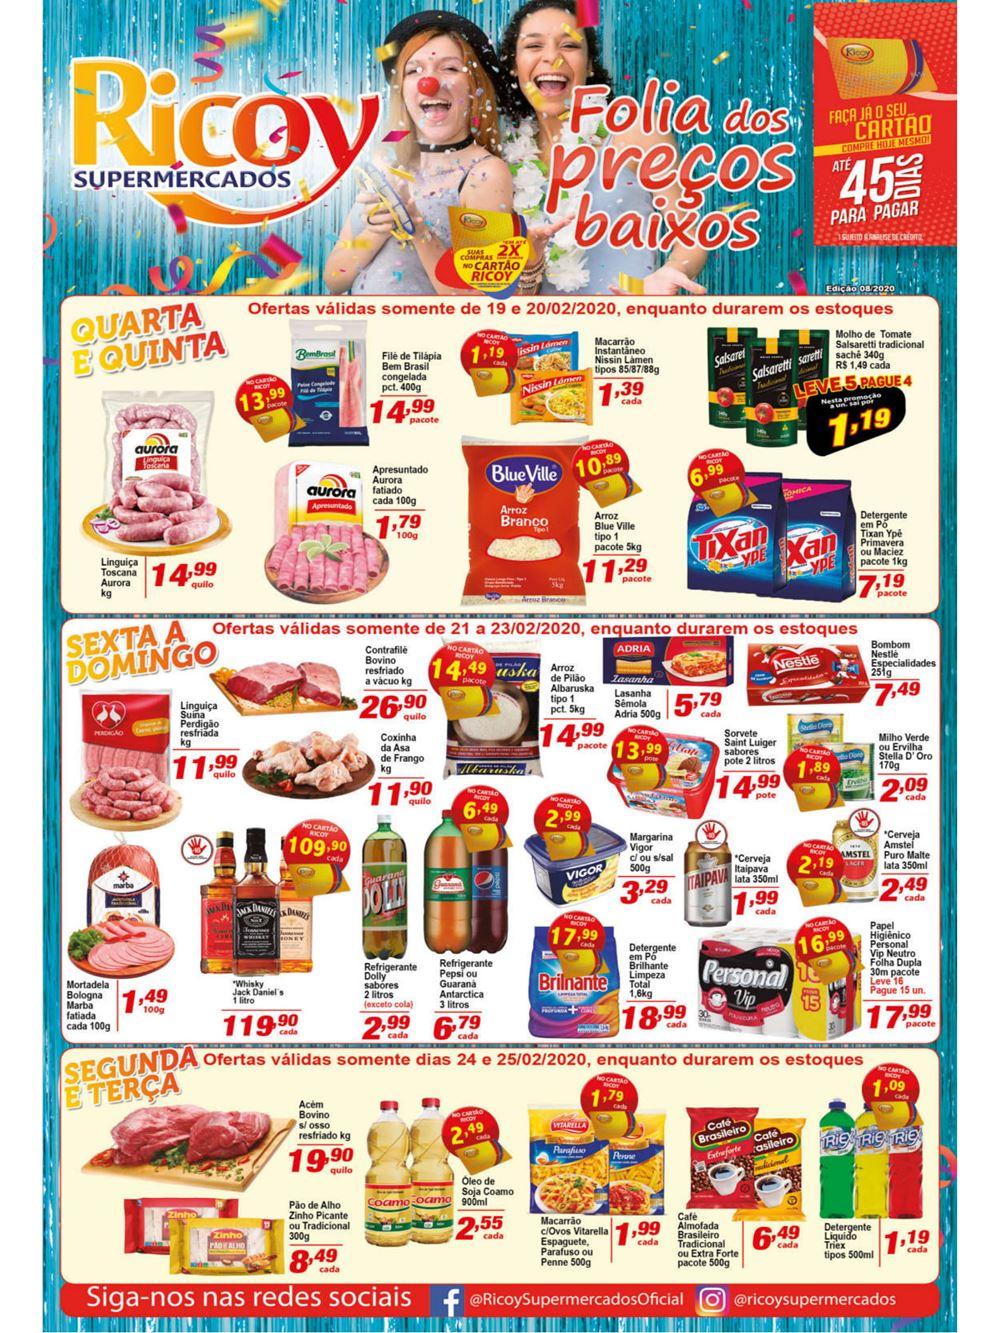 ricoy-Ofertas-tabloide1-2 Ofertas de supermercados - Hoje